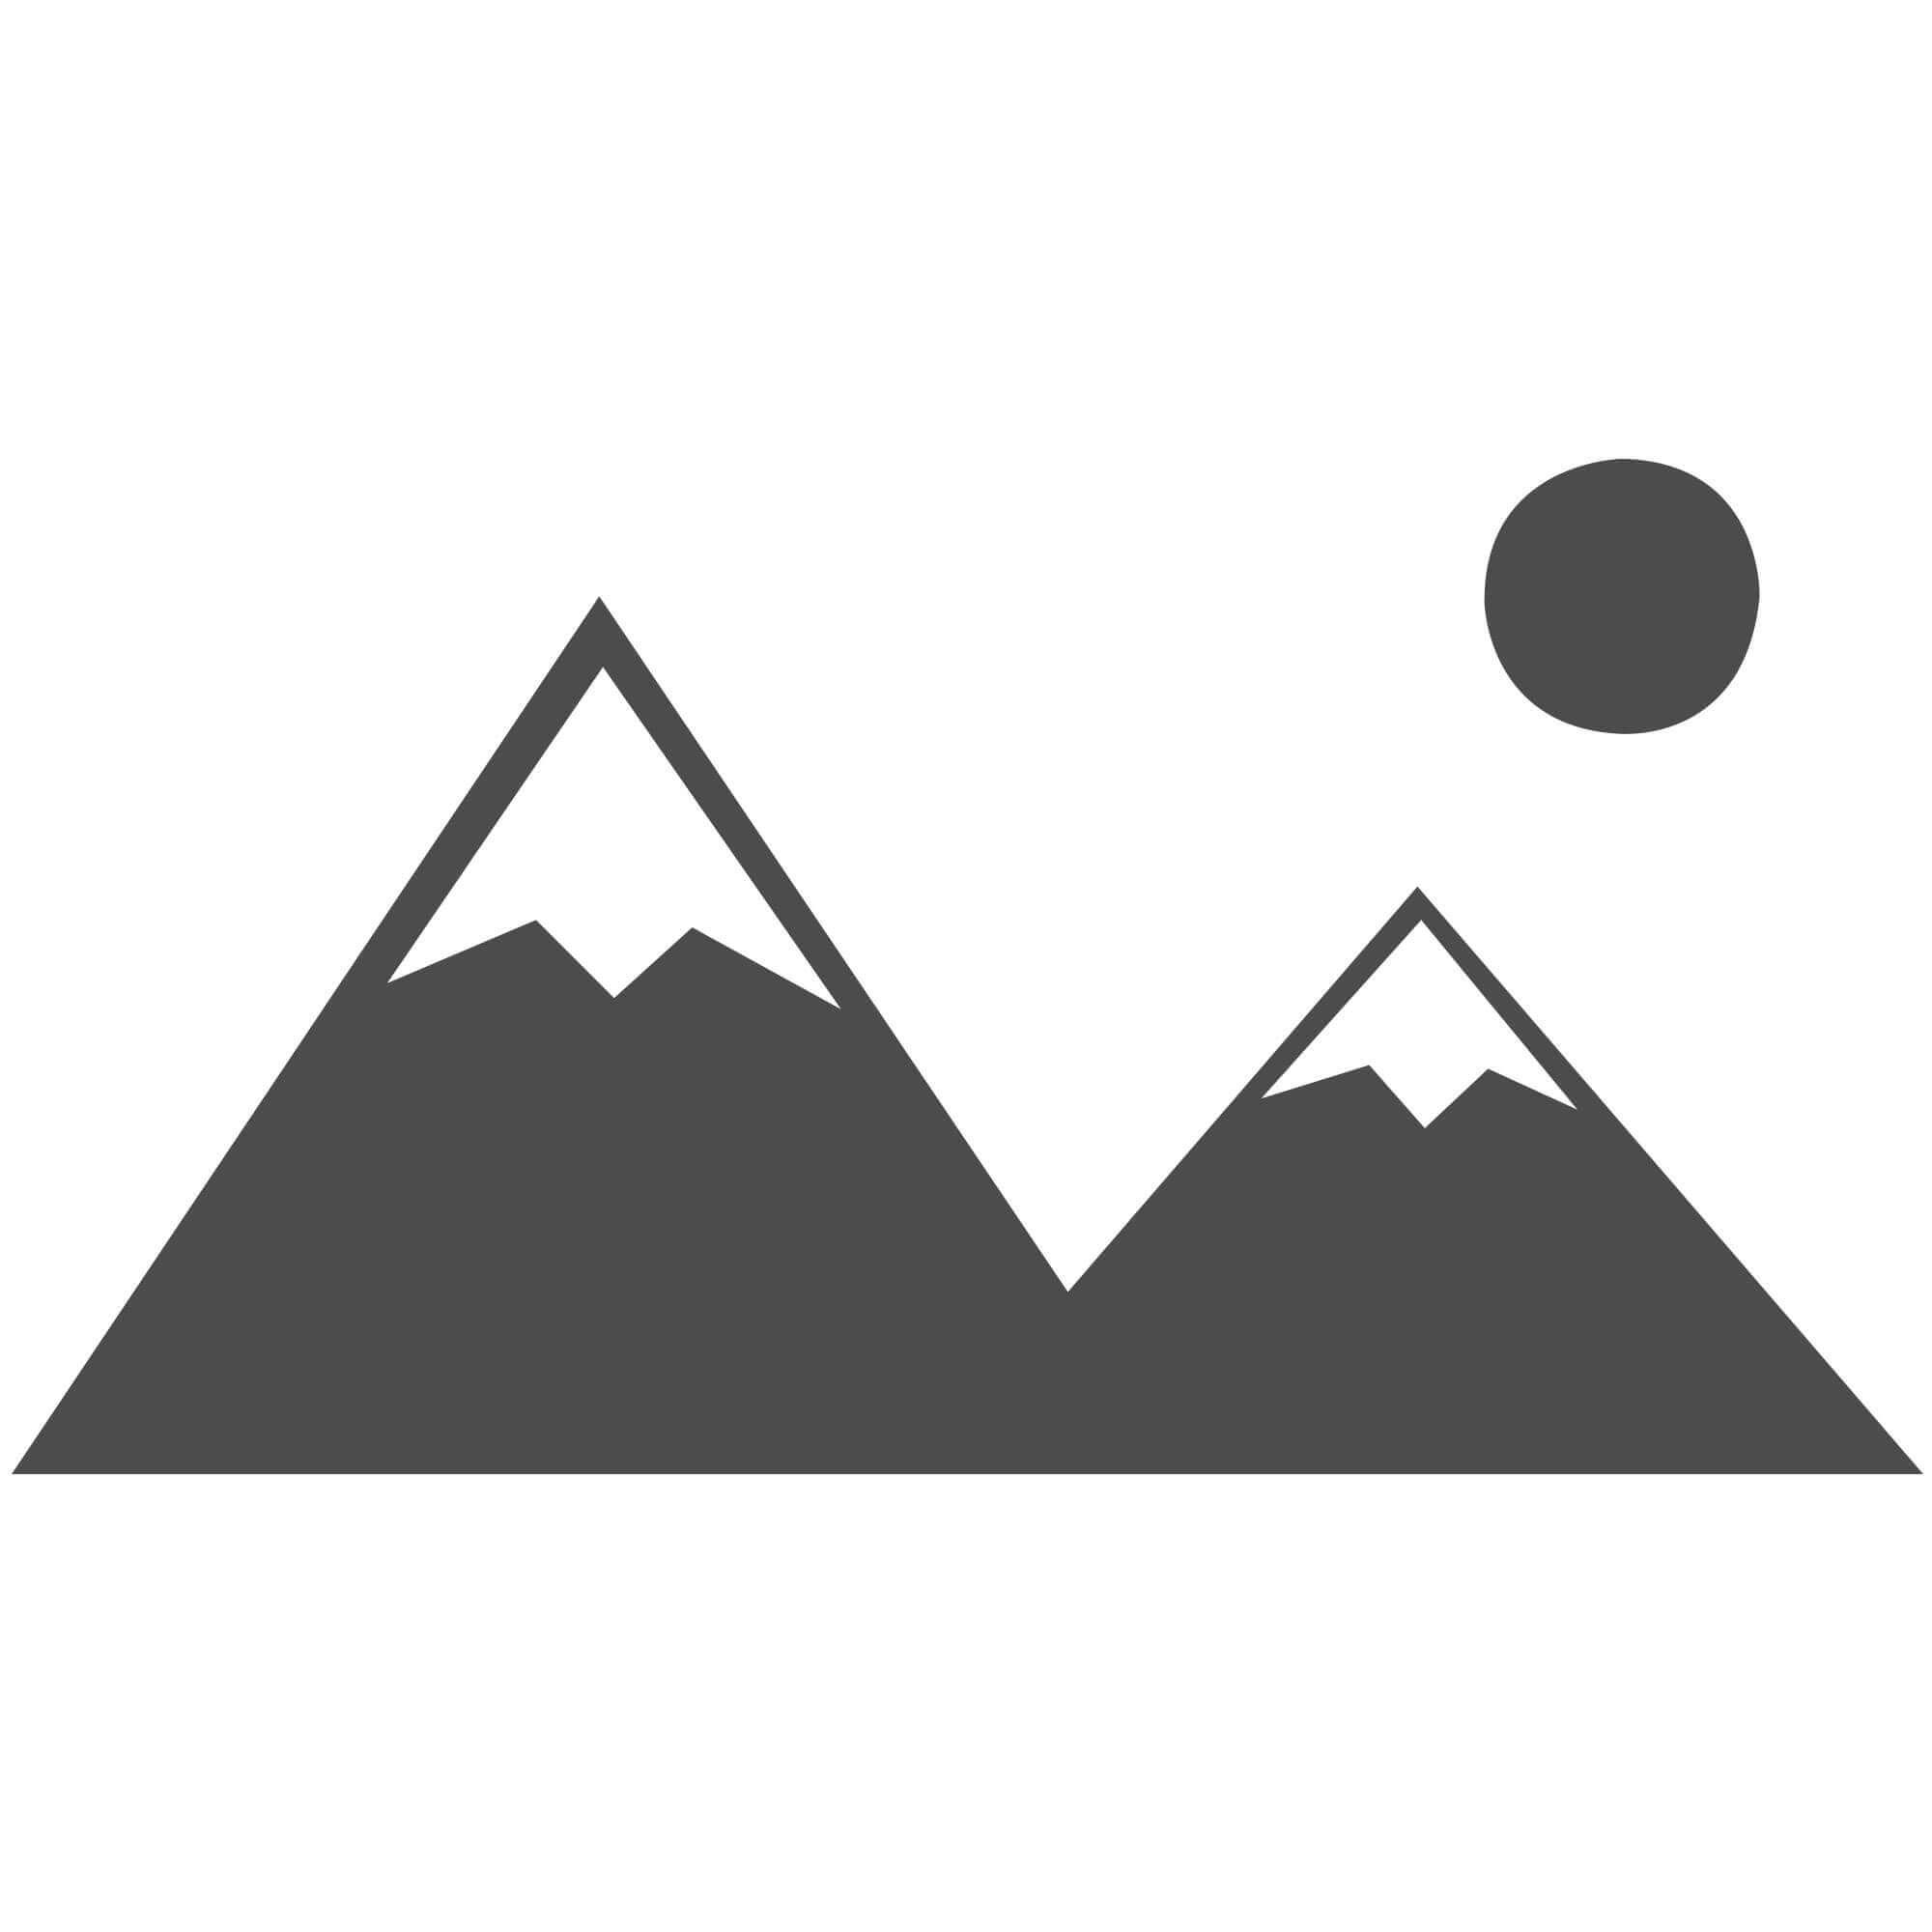 Griot Stripe Rug - Uhadi - KI807 Chili Pepper-122 x 183 cm (4' x 6')